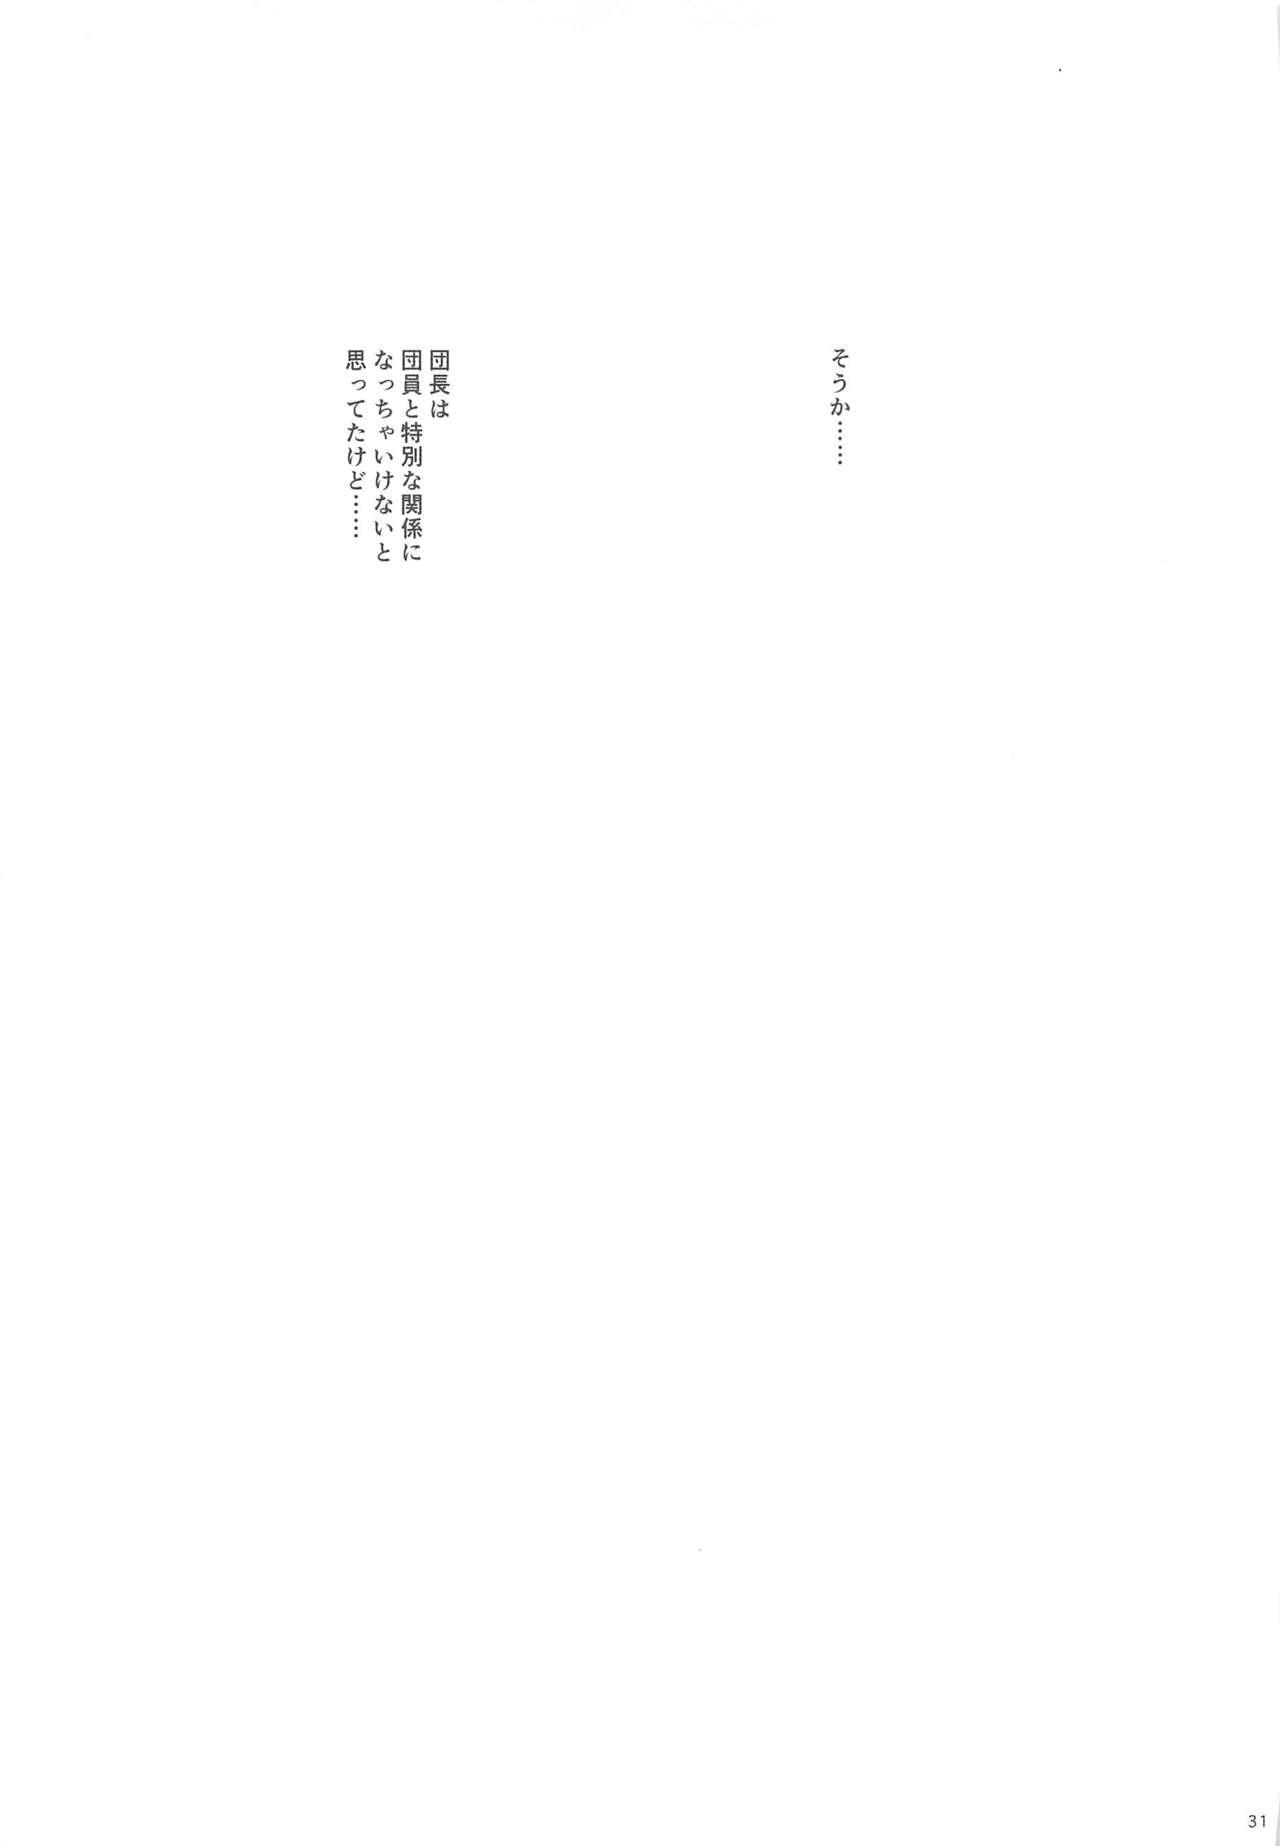 [Shigunyan (Shigunyan)] Onee-chan-tachi ni Amaete ne (Granblue Fantasy) 29